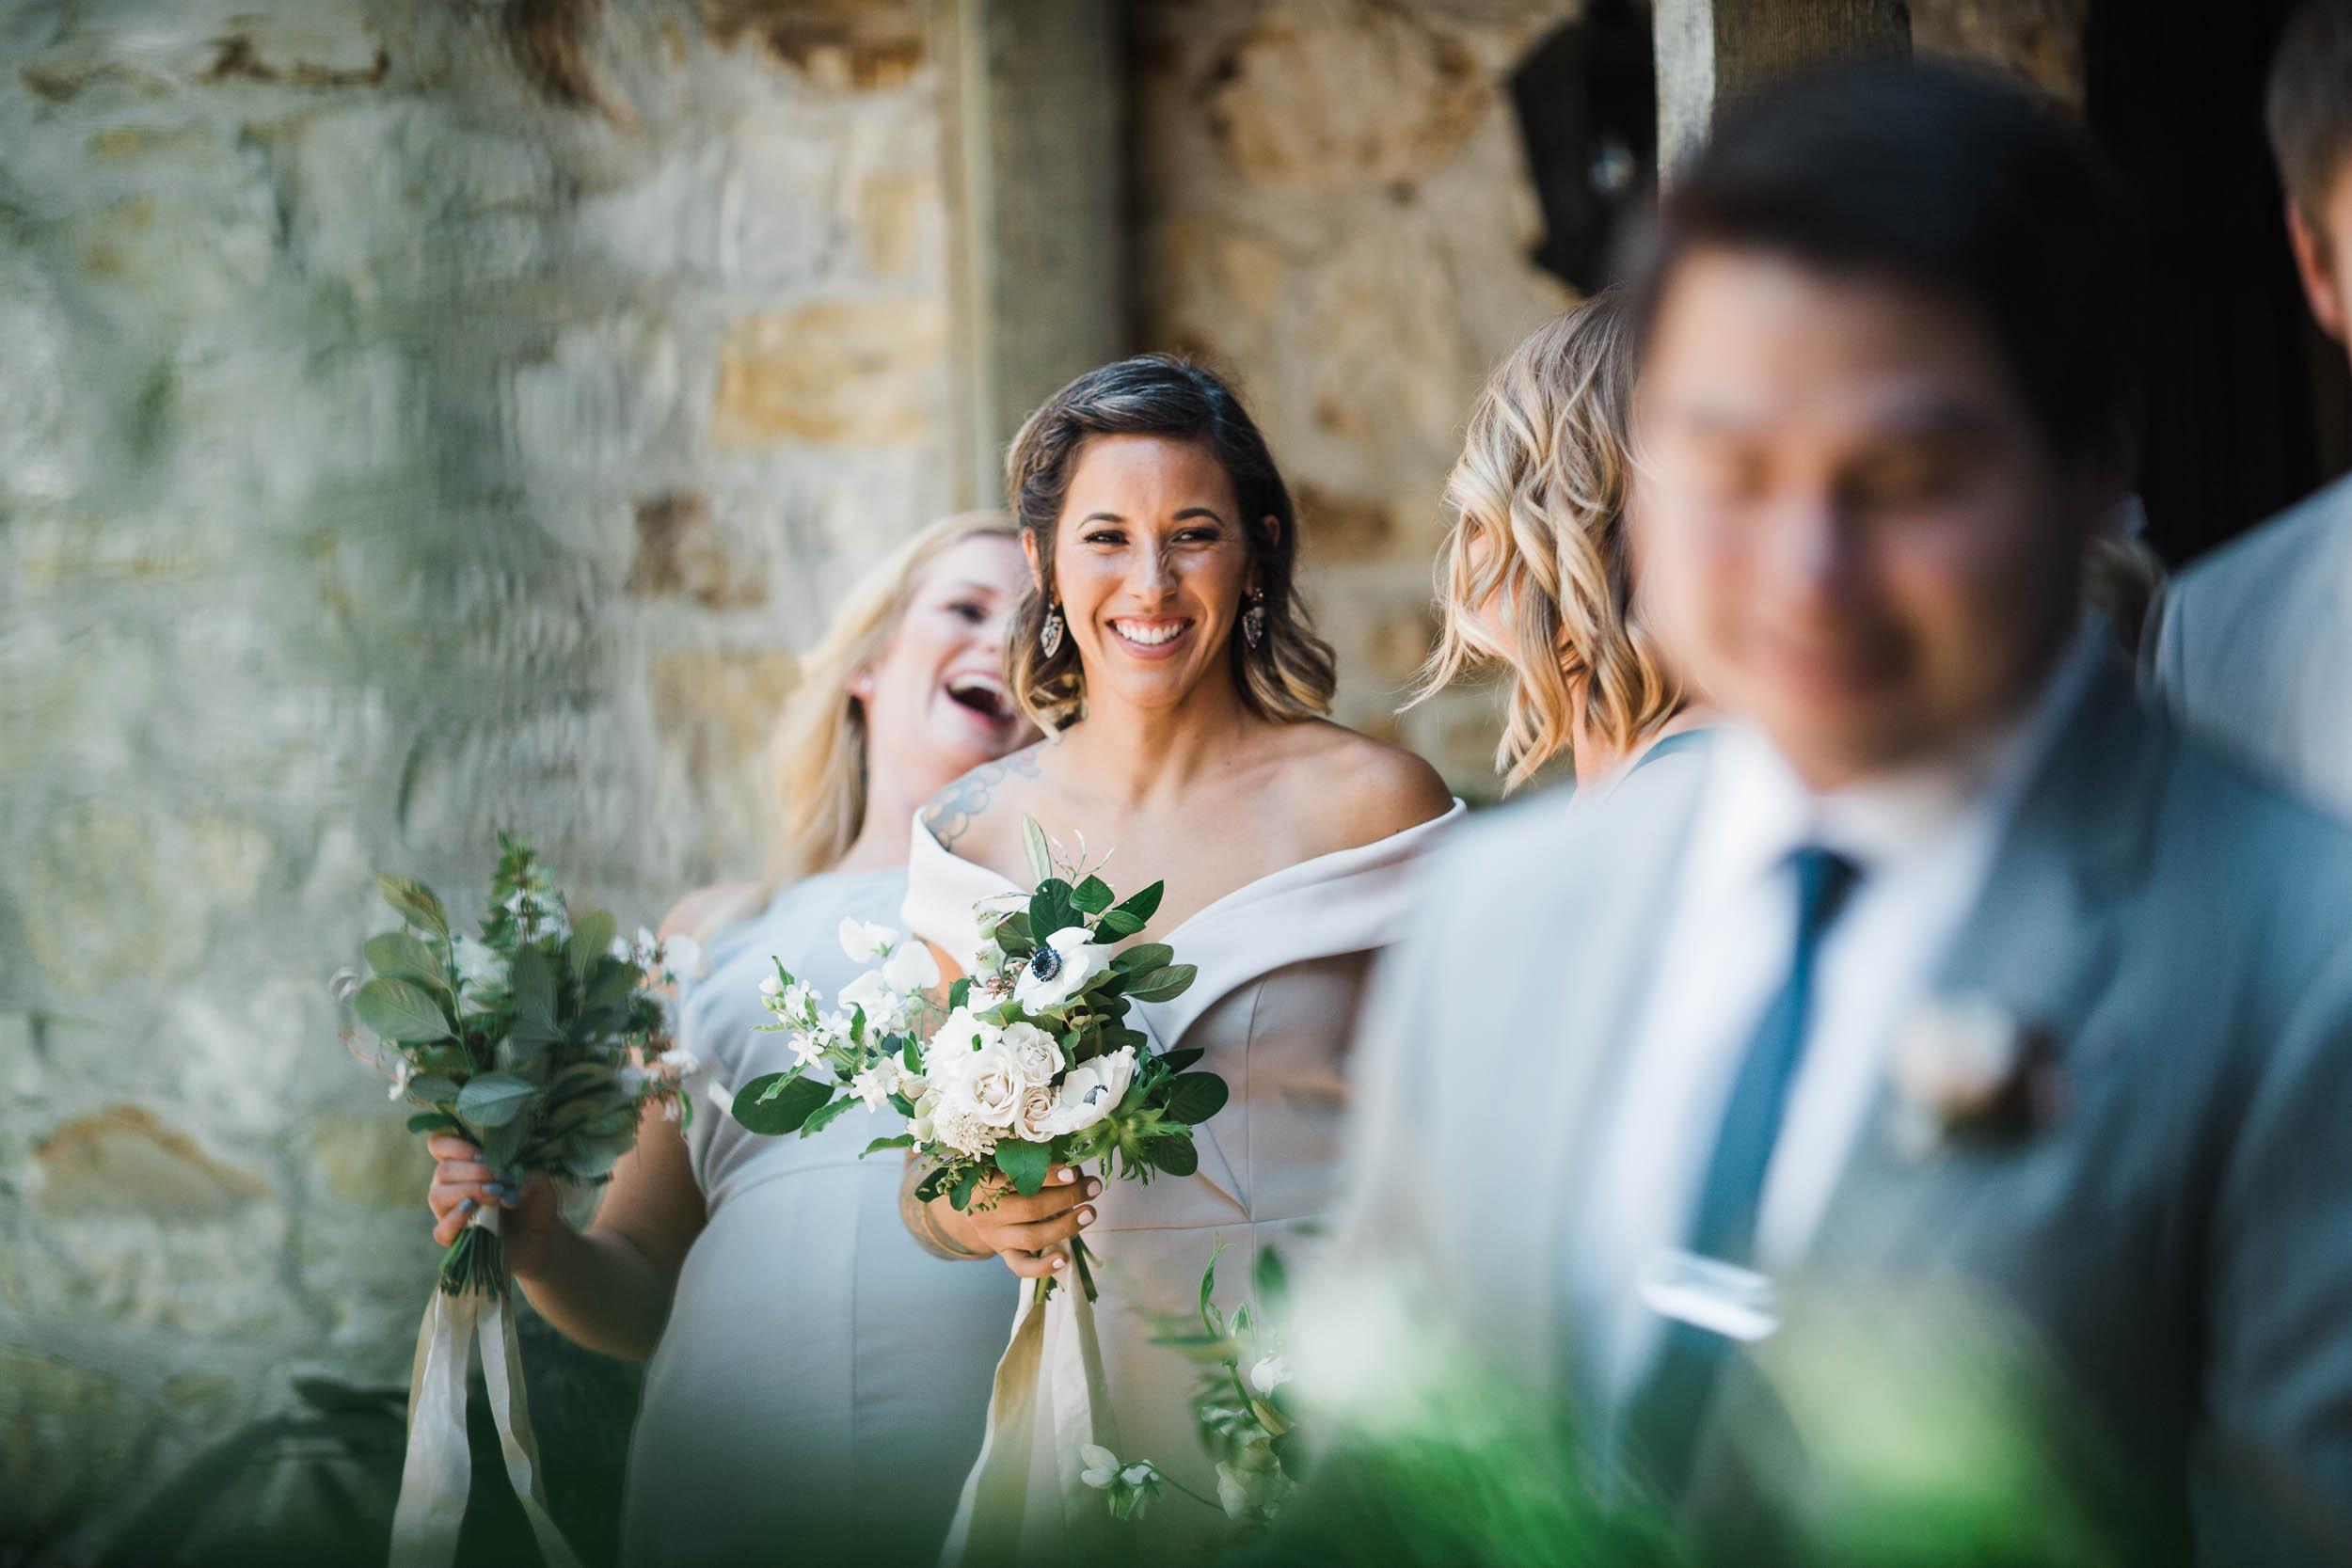 030_072118_D+K_Holman Ranch Wedding_Buena Lane Photography_2309TV copy.jpg